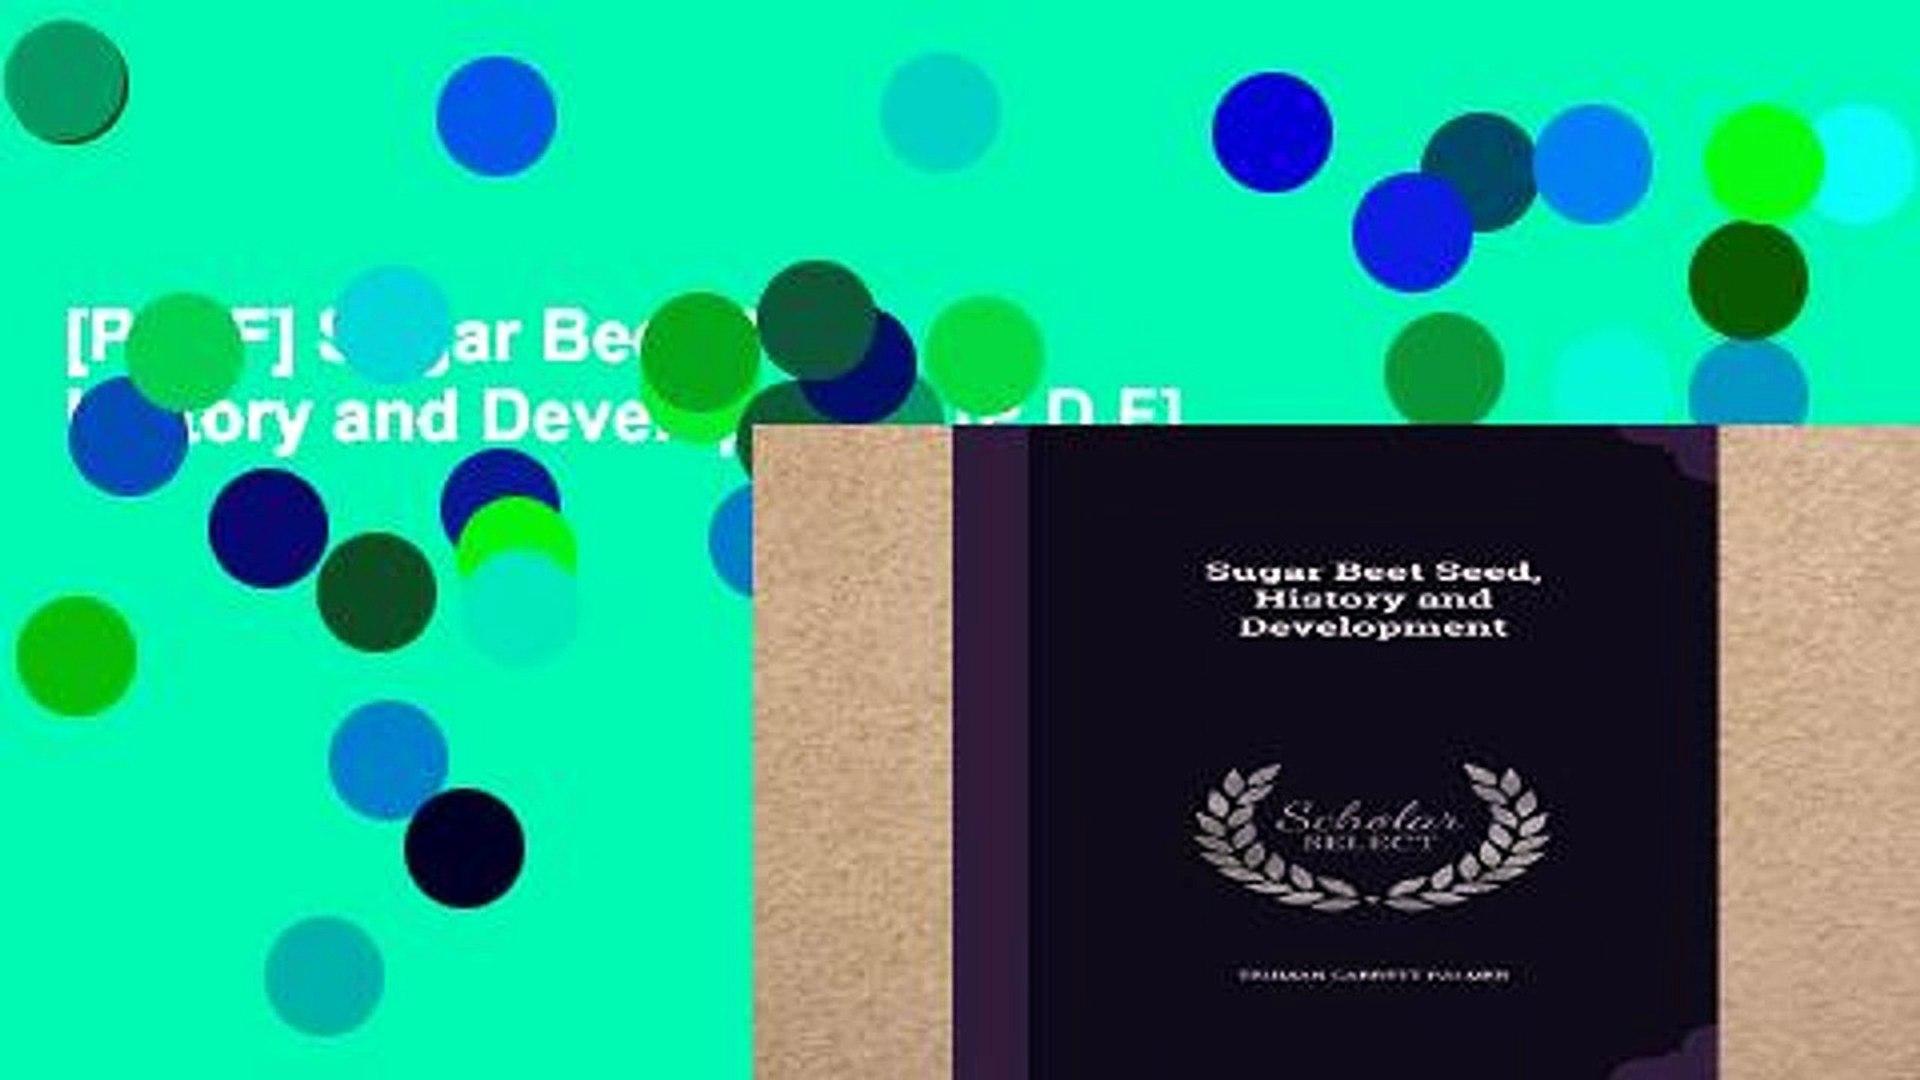 [P.D.F] Sugar Beet Seed, History and Development [P.D.F]